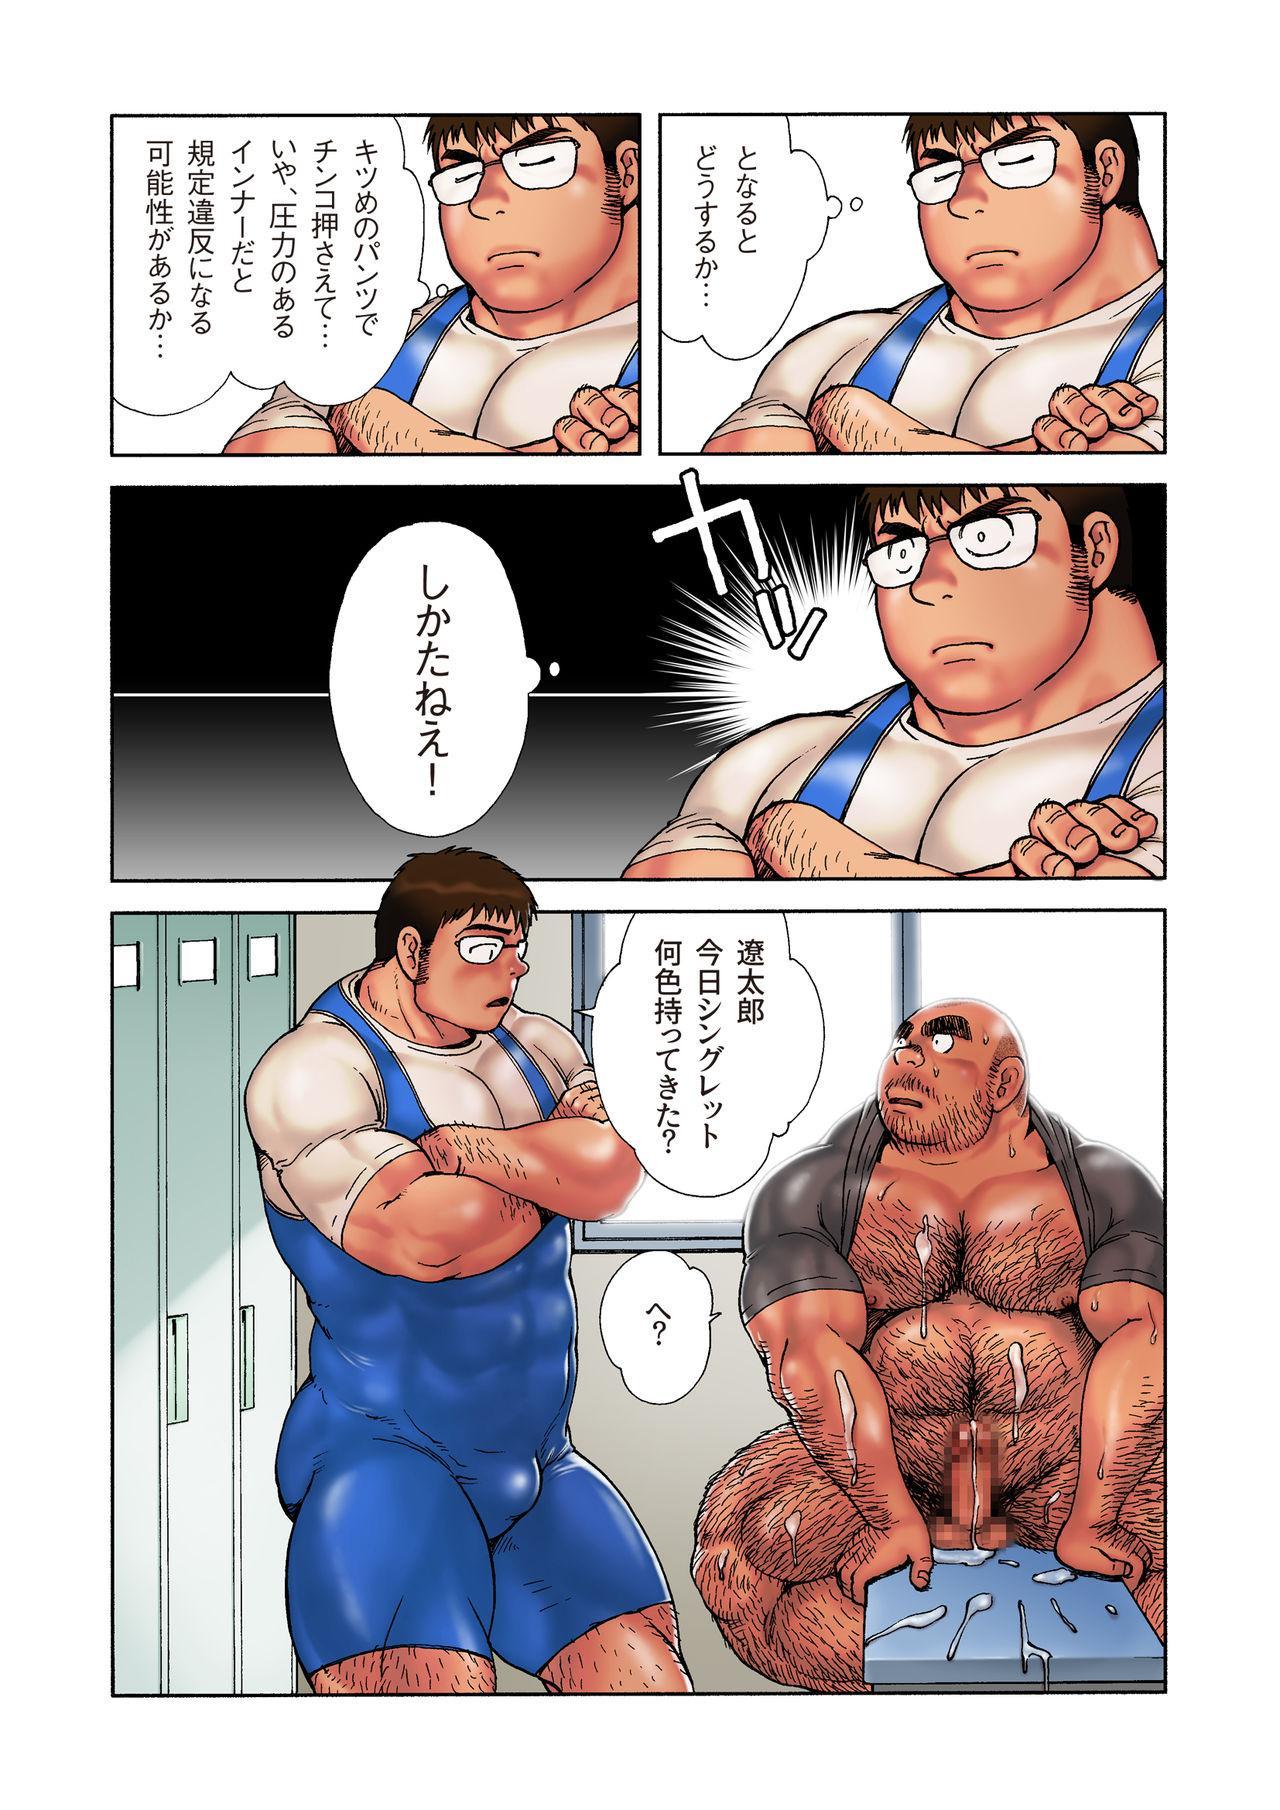 Danshi Koukousei Weightlifter Shiai-chuu, Osae kirenai Wakai Takeri 48